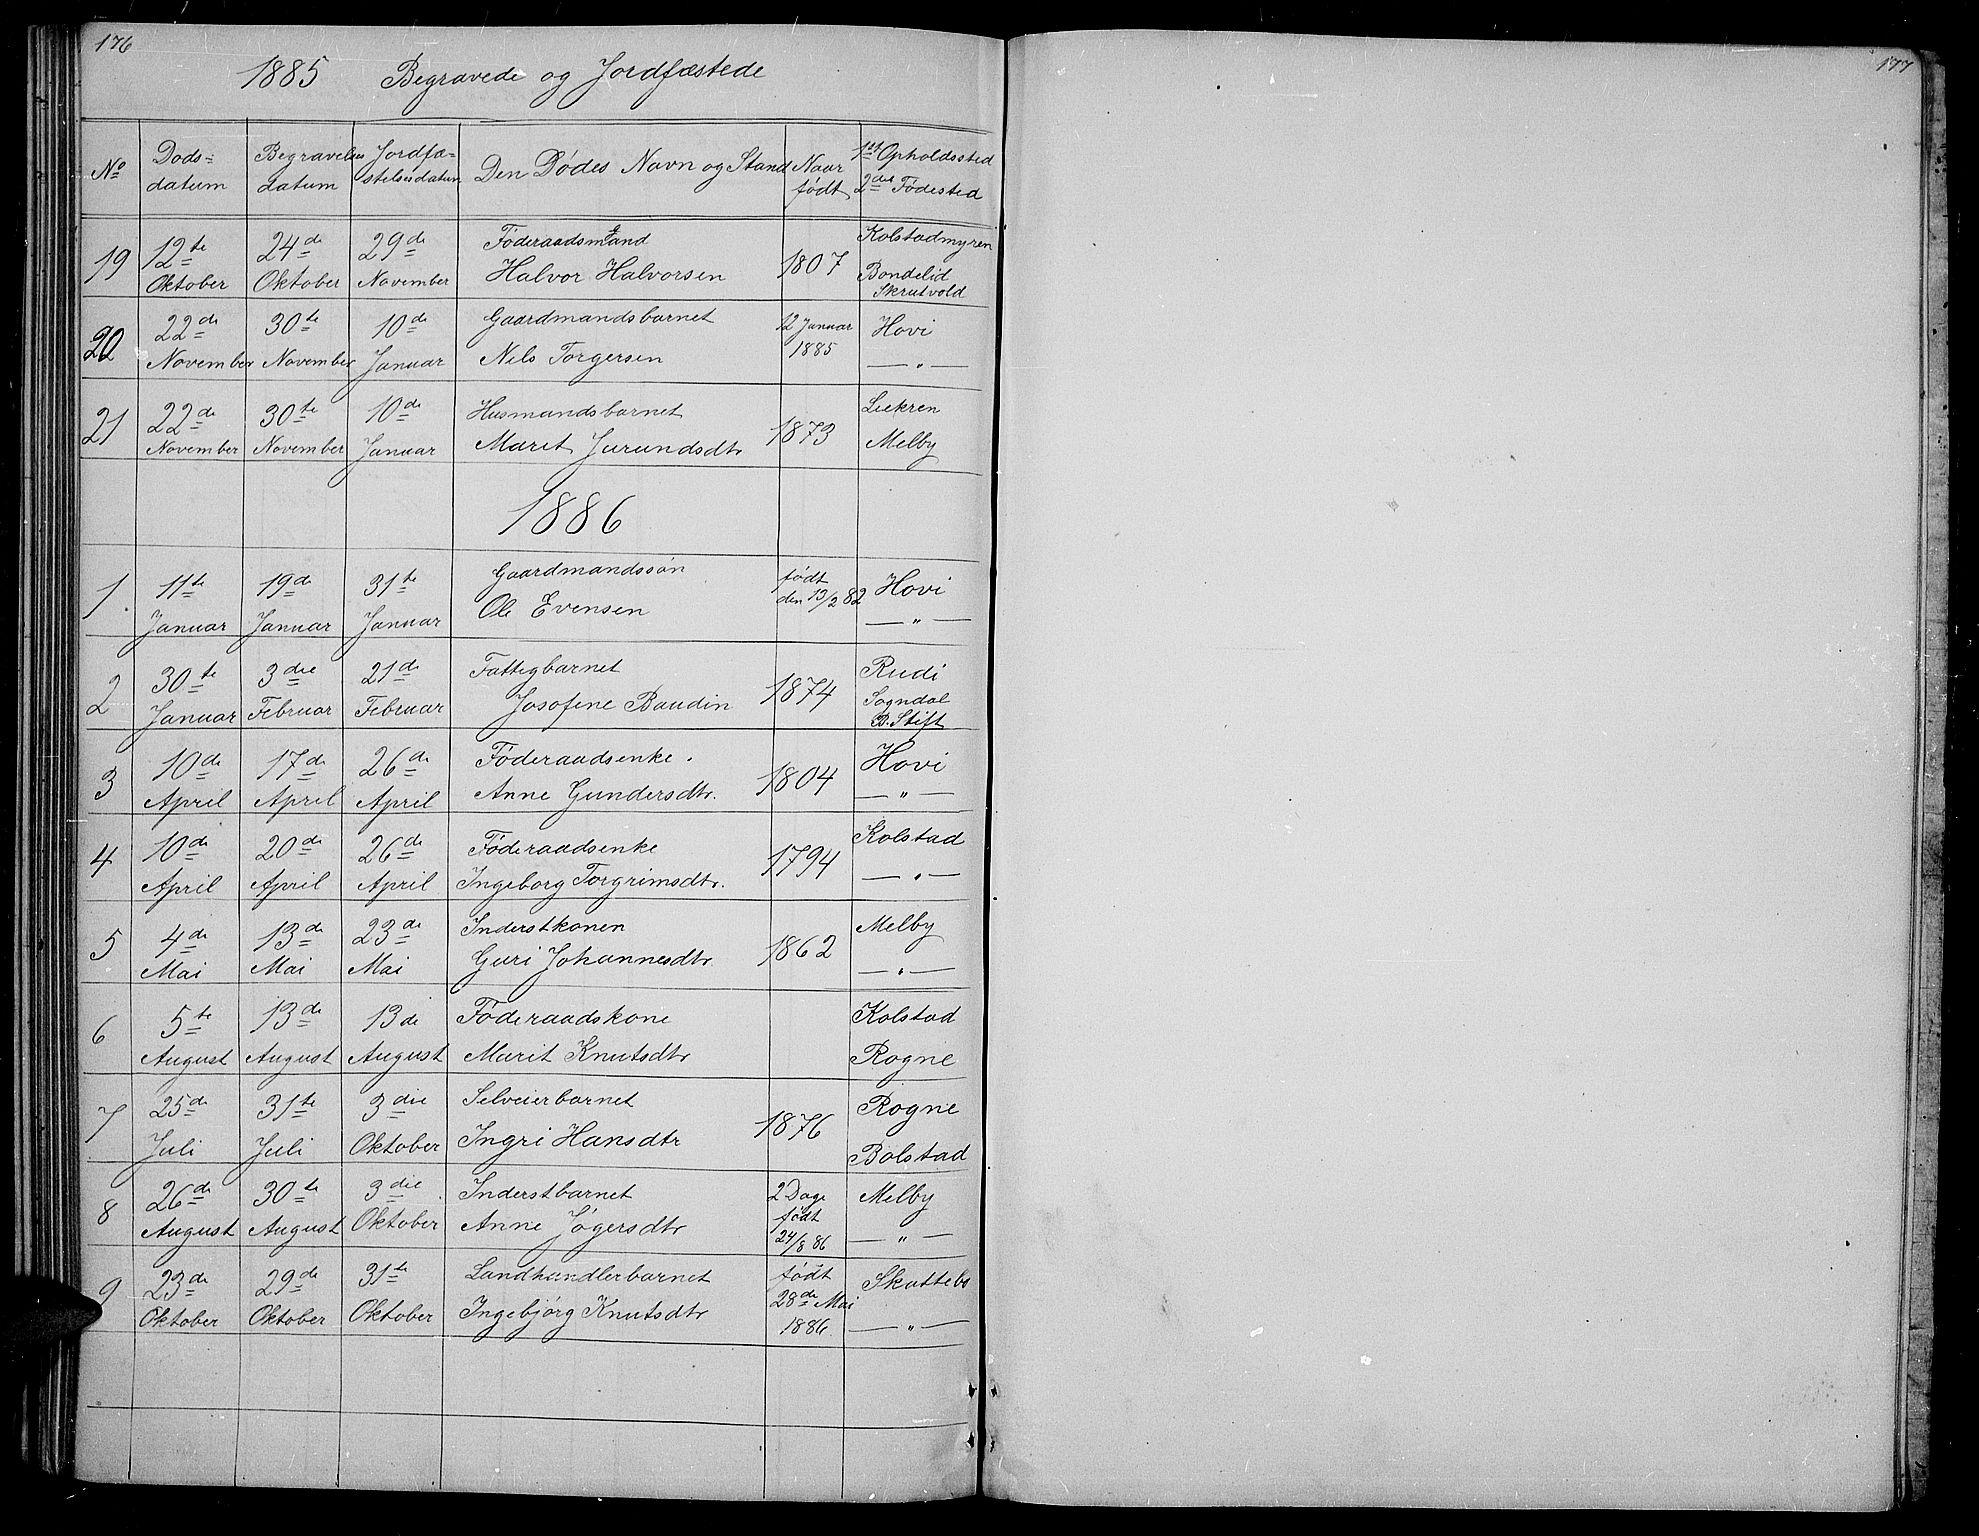 SAH, Øystre Slidre prestekontor, Klokkerbok nr. 3, 1866-1886, s. 176-177